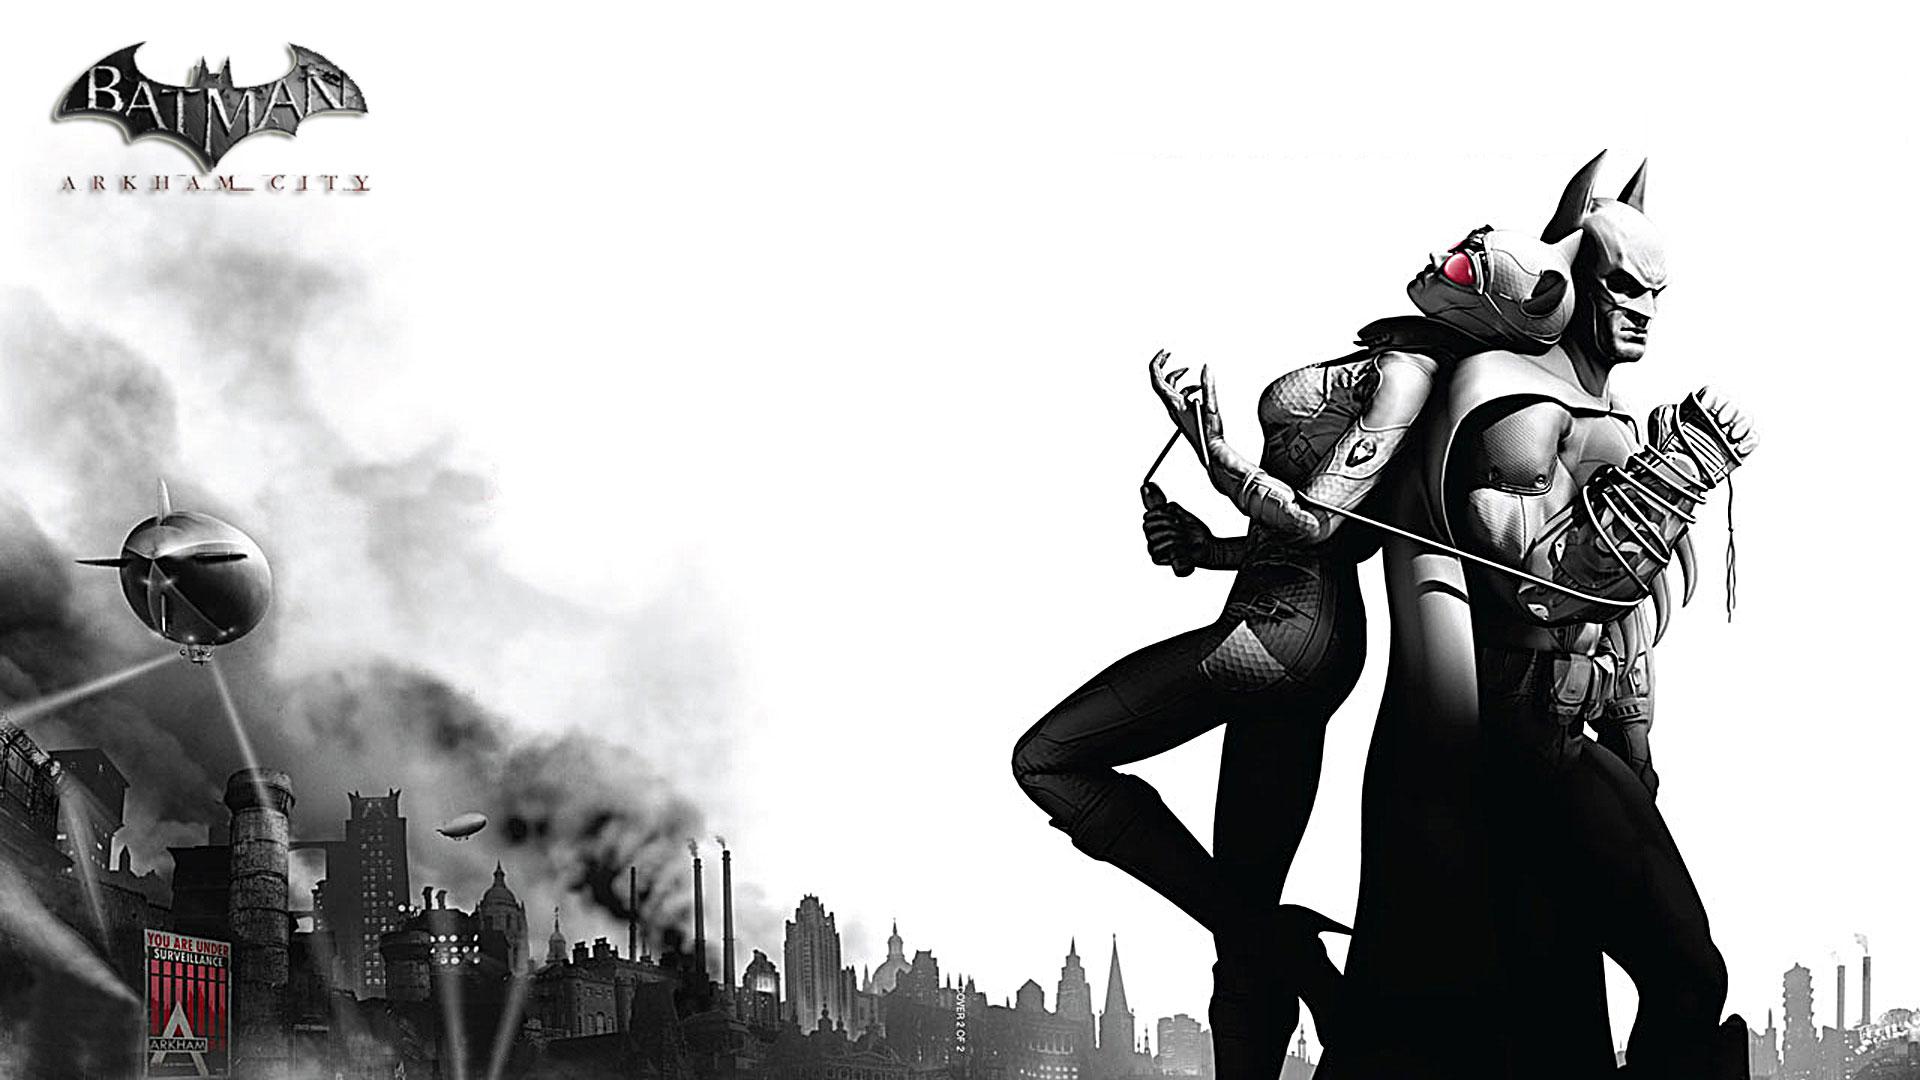 Batman Arkham City Wallpapers in HD High Resolution 1920x1080